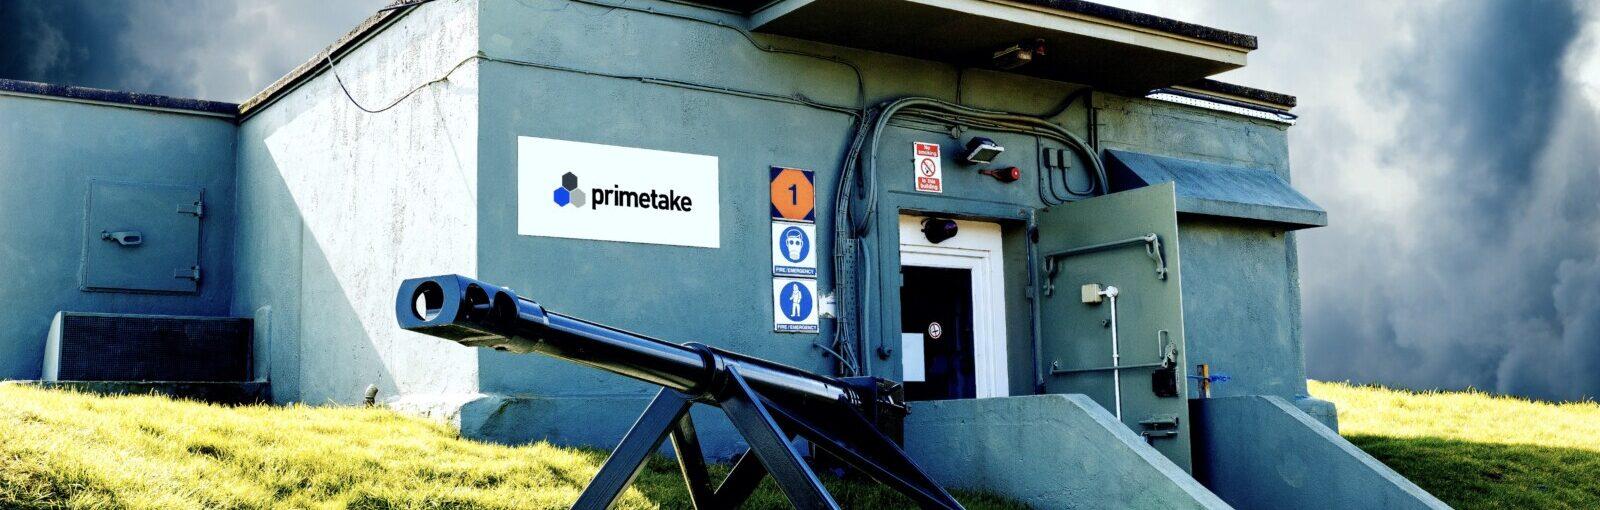 Primetake Testing Site